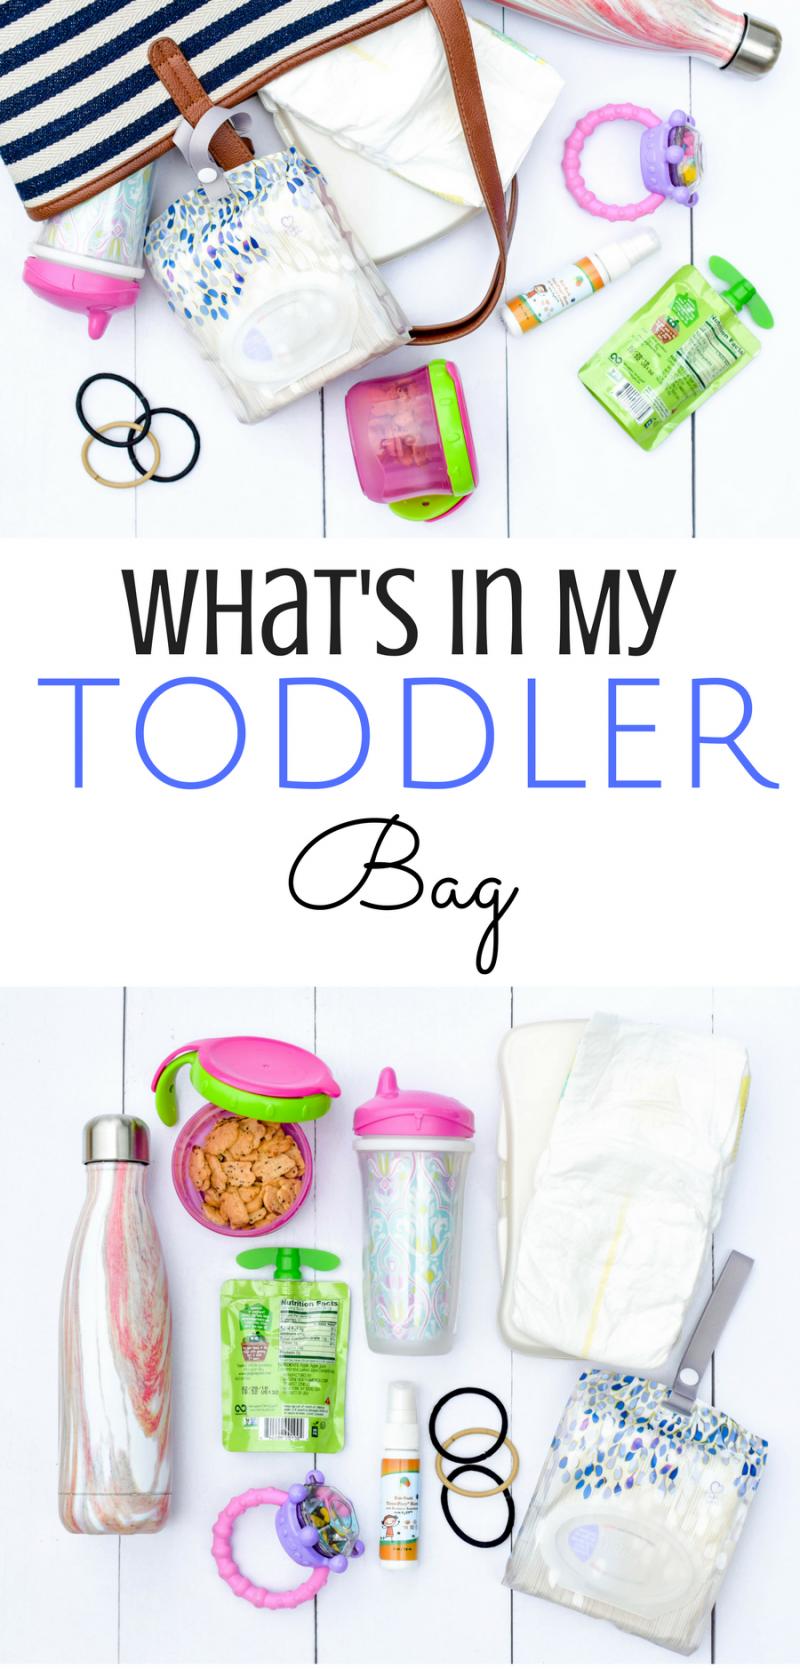 Toddler Stuff Diaper Bag Kid Essentials Kleenex Go Anywhere Packs Cups Snacks Toys Children Paing